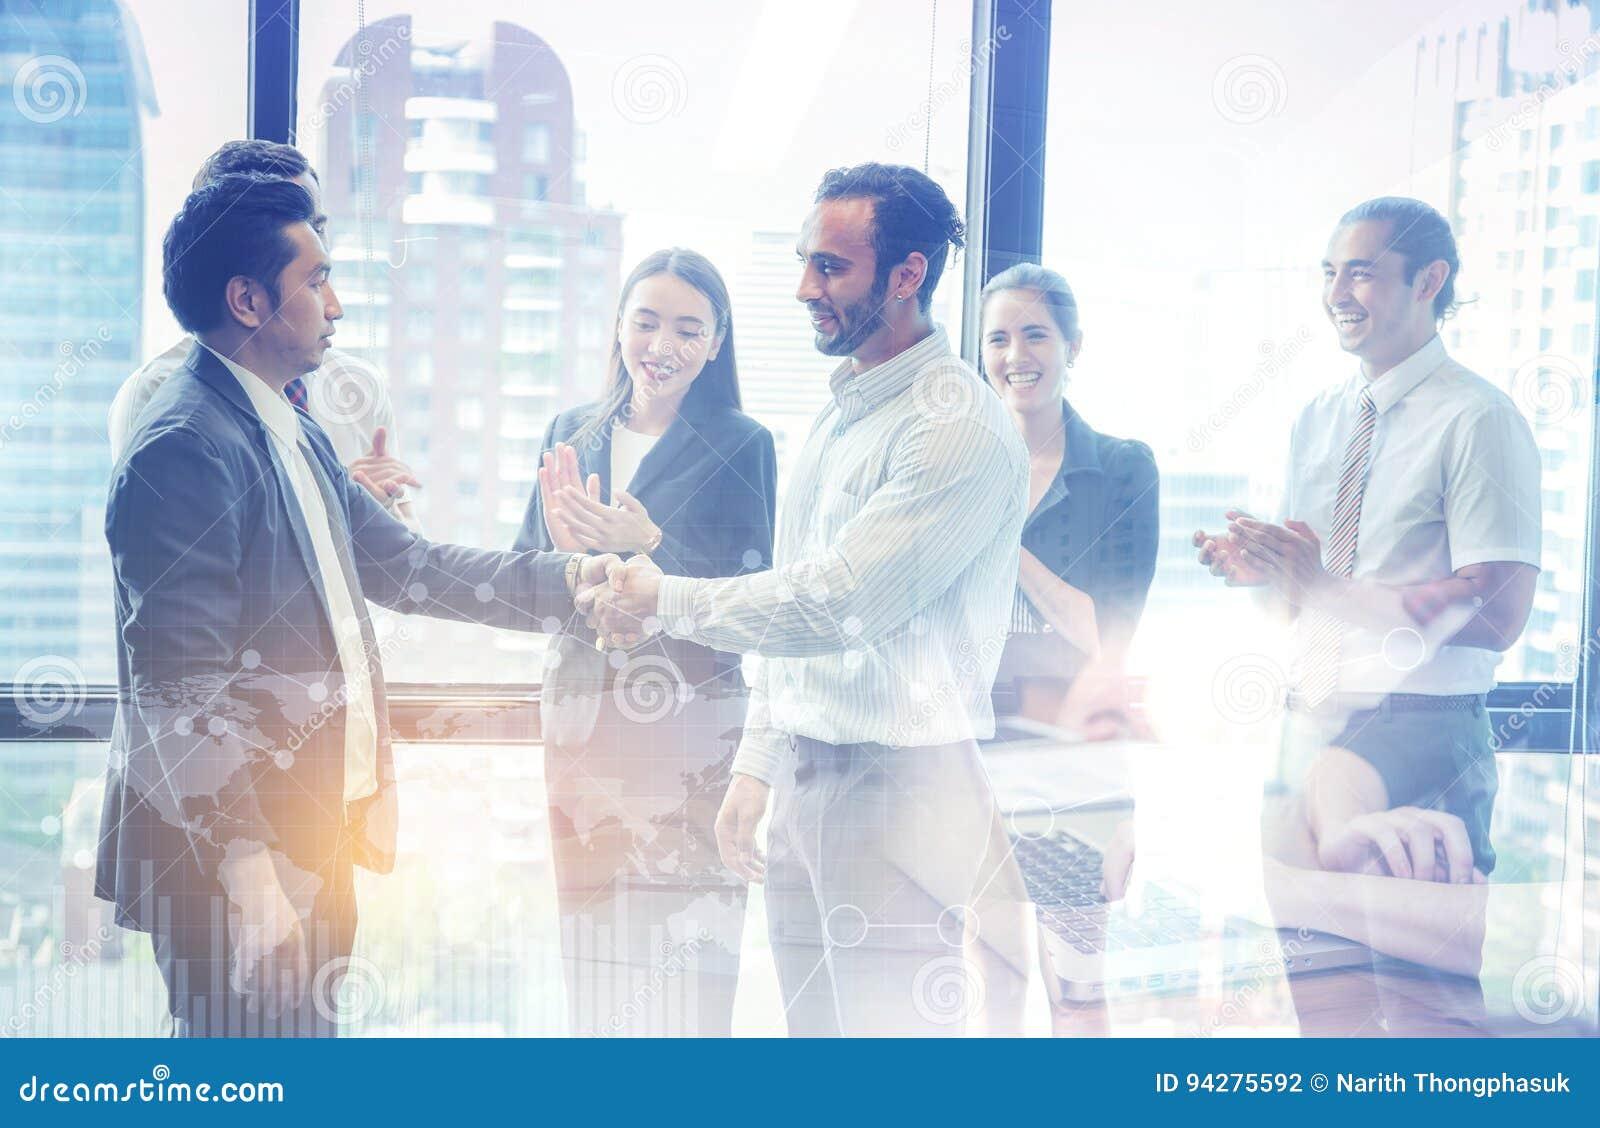 Stretta di mano e gente di affari di affari Uomini d affari da congratularsi